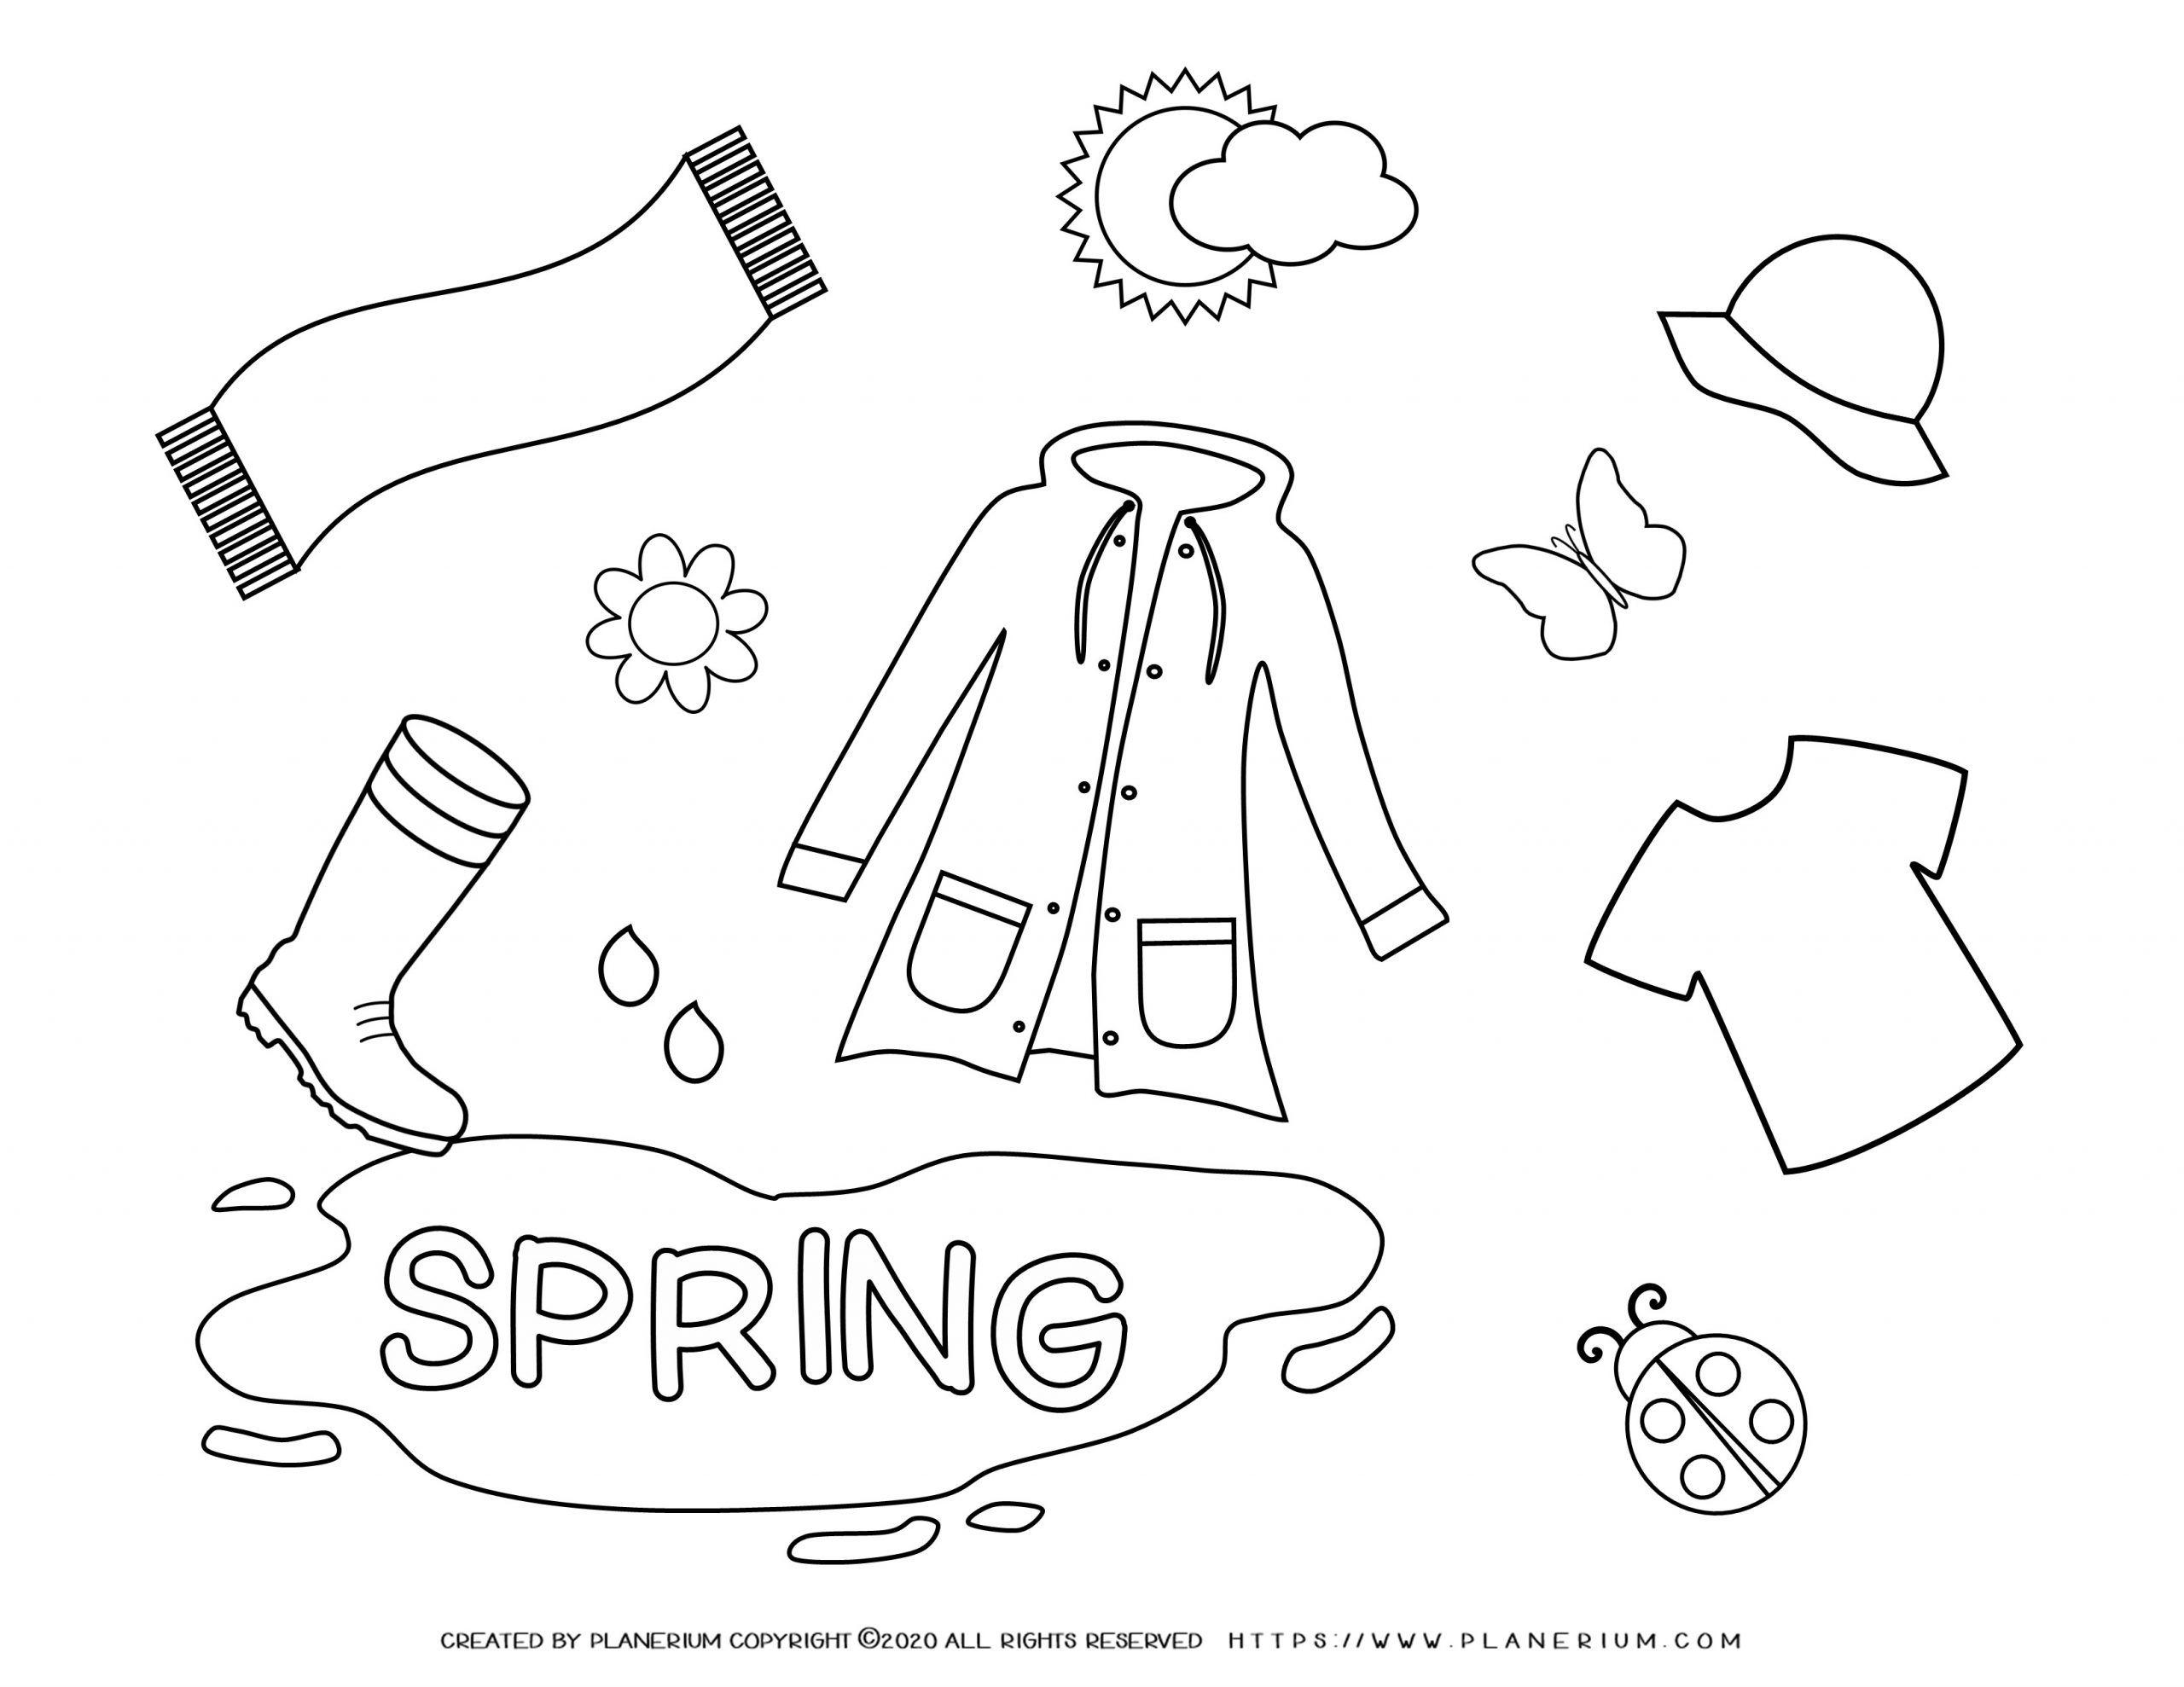 Spring coloring page - Season cloths